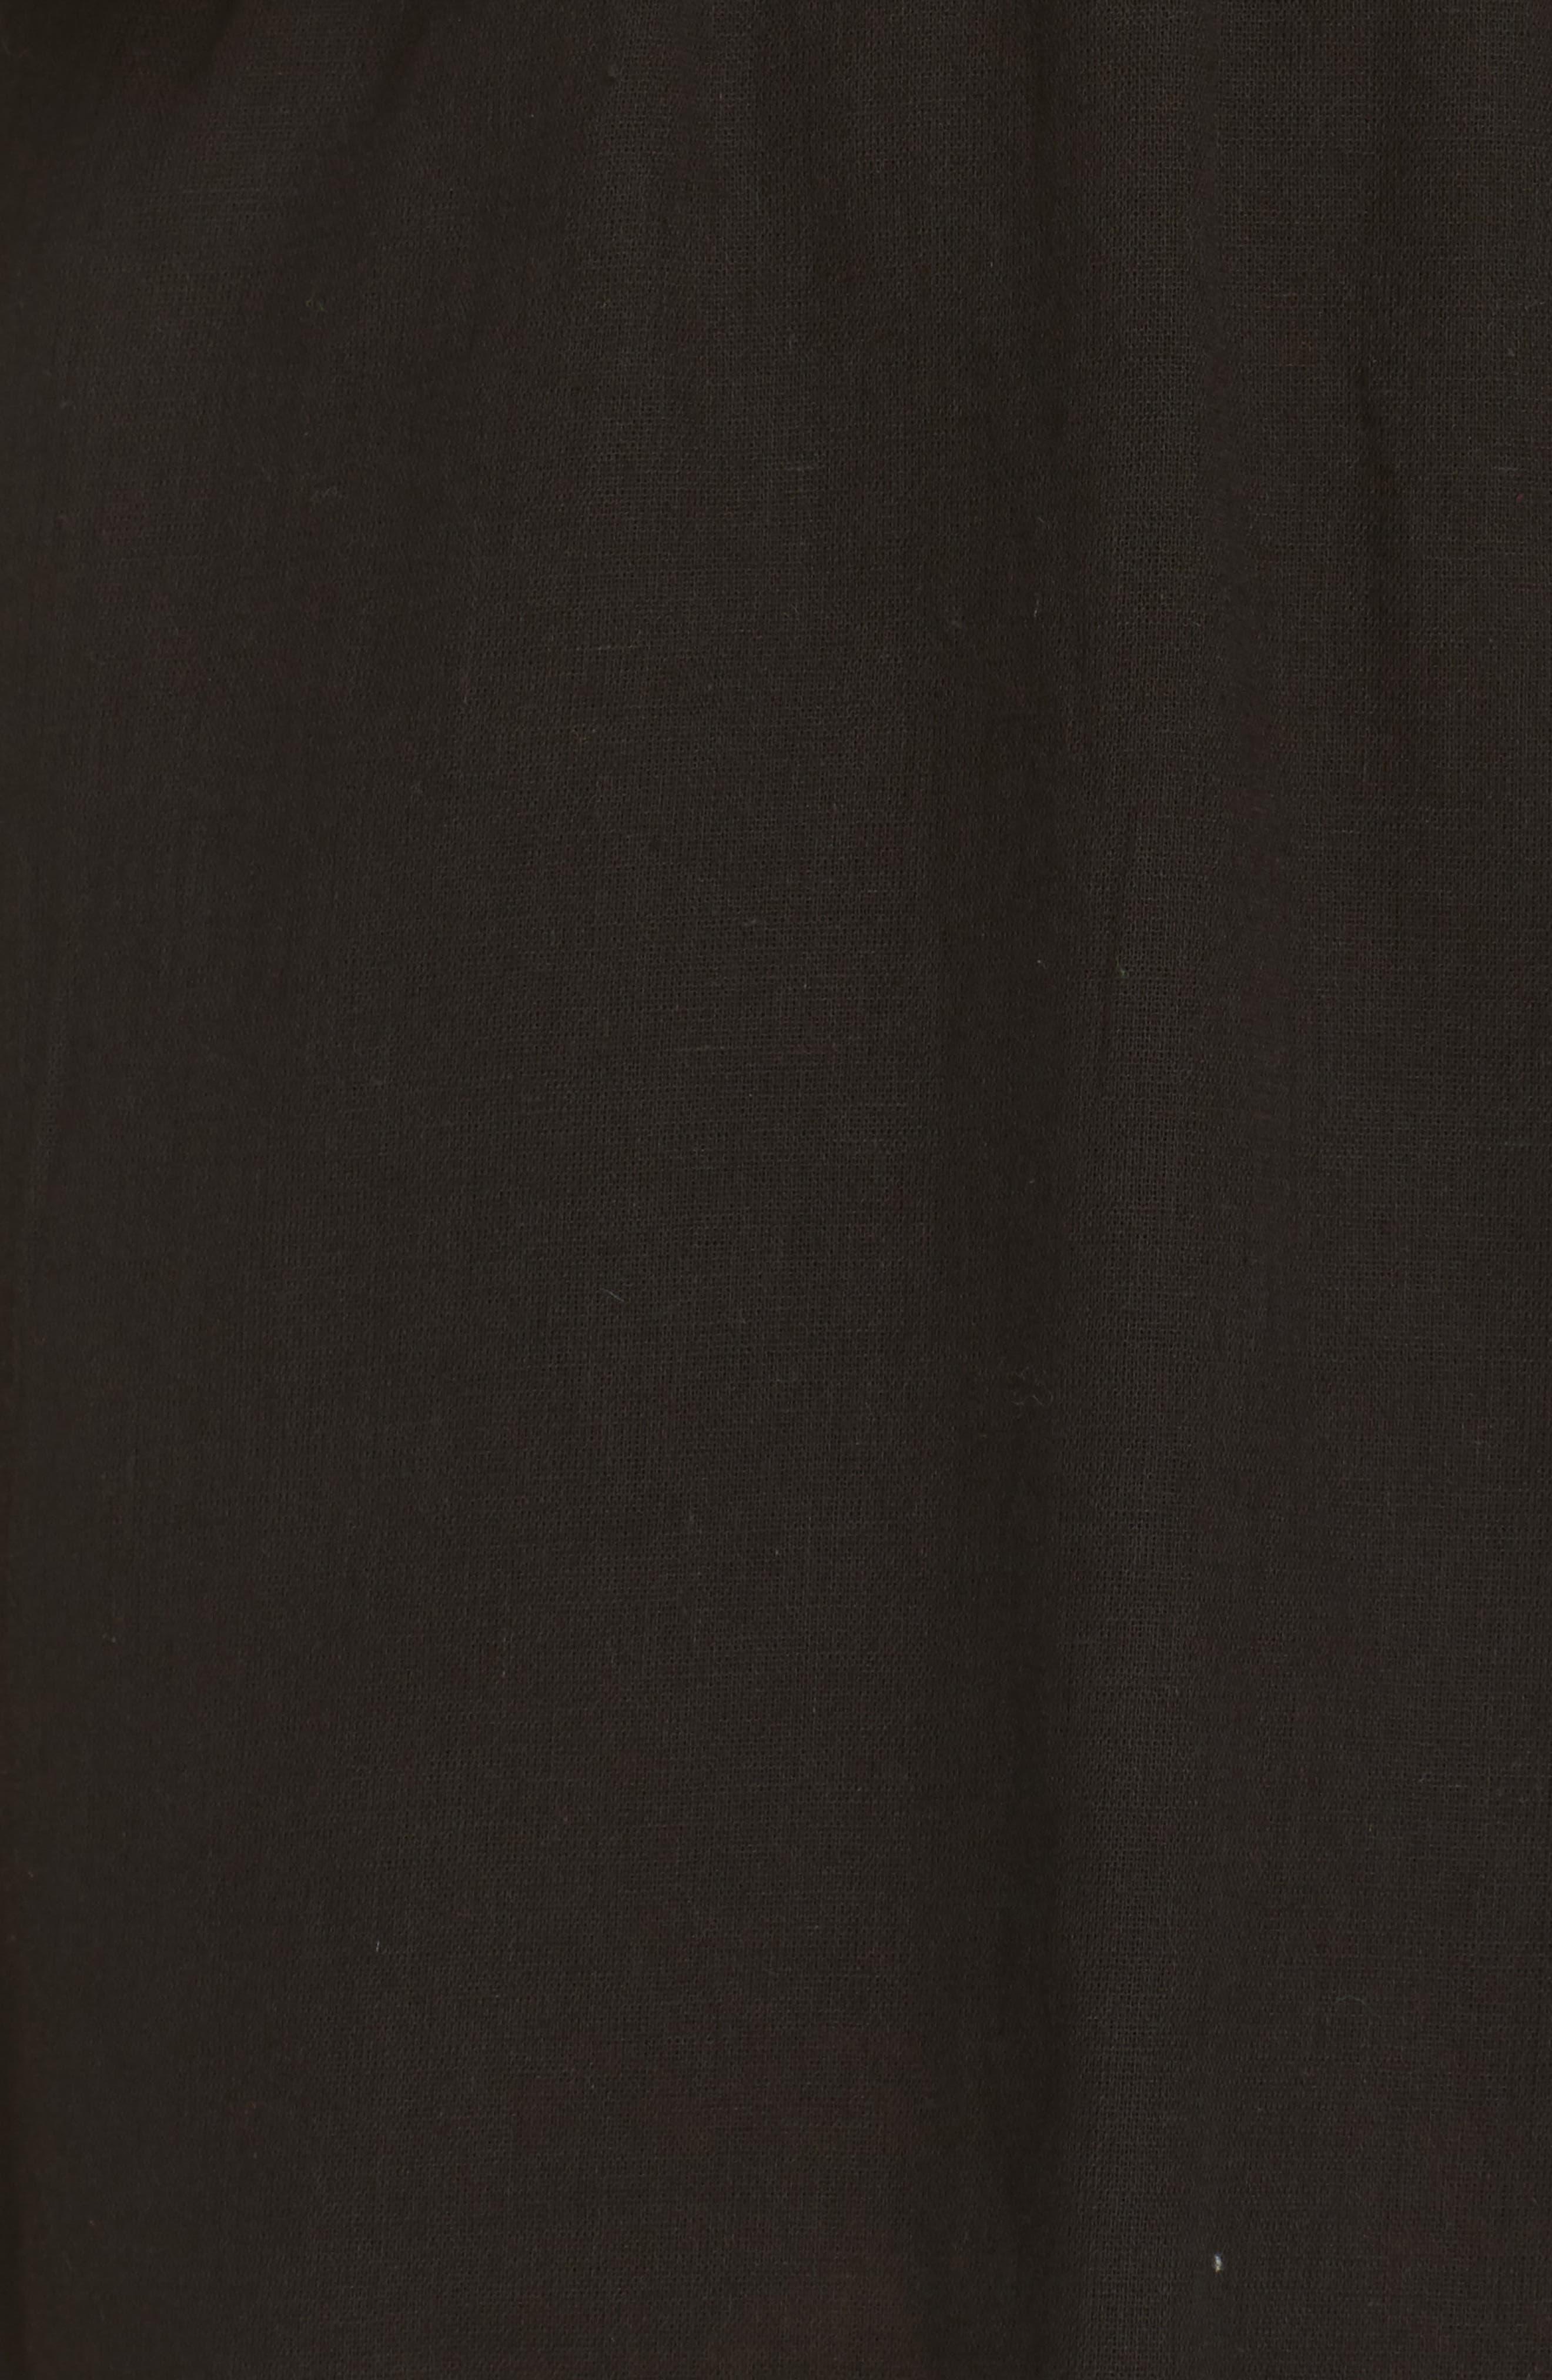 PomPom Festival Cover-Up Dress,                             Alternate thumbnail 5, color,                             Black